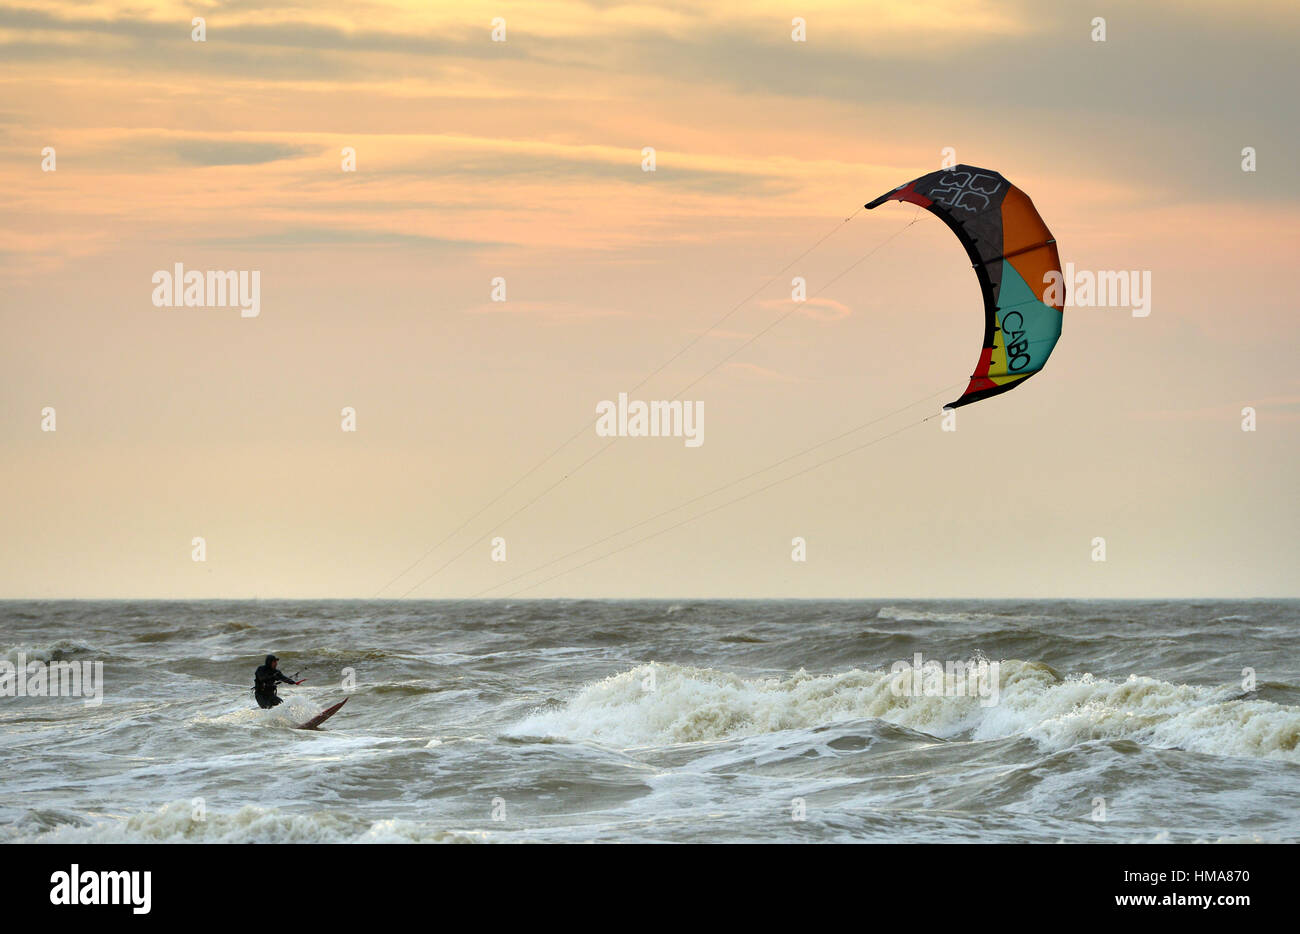 2nd february 2017 kite surfers taking advantage of windy